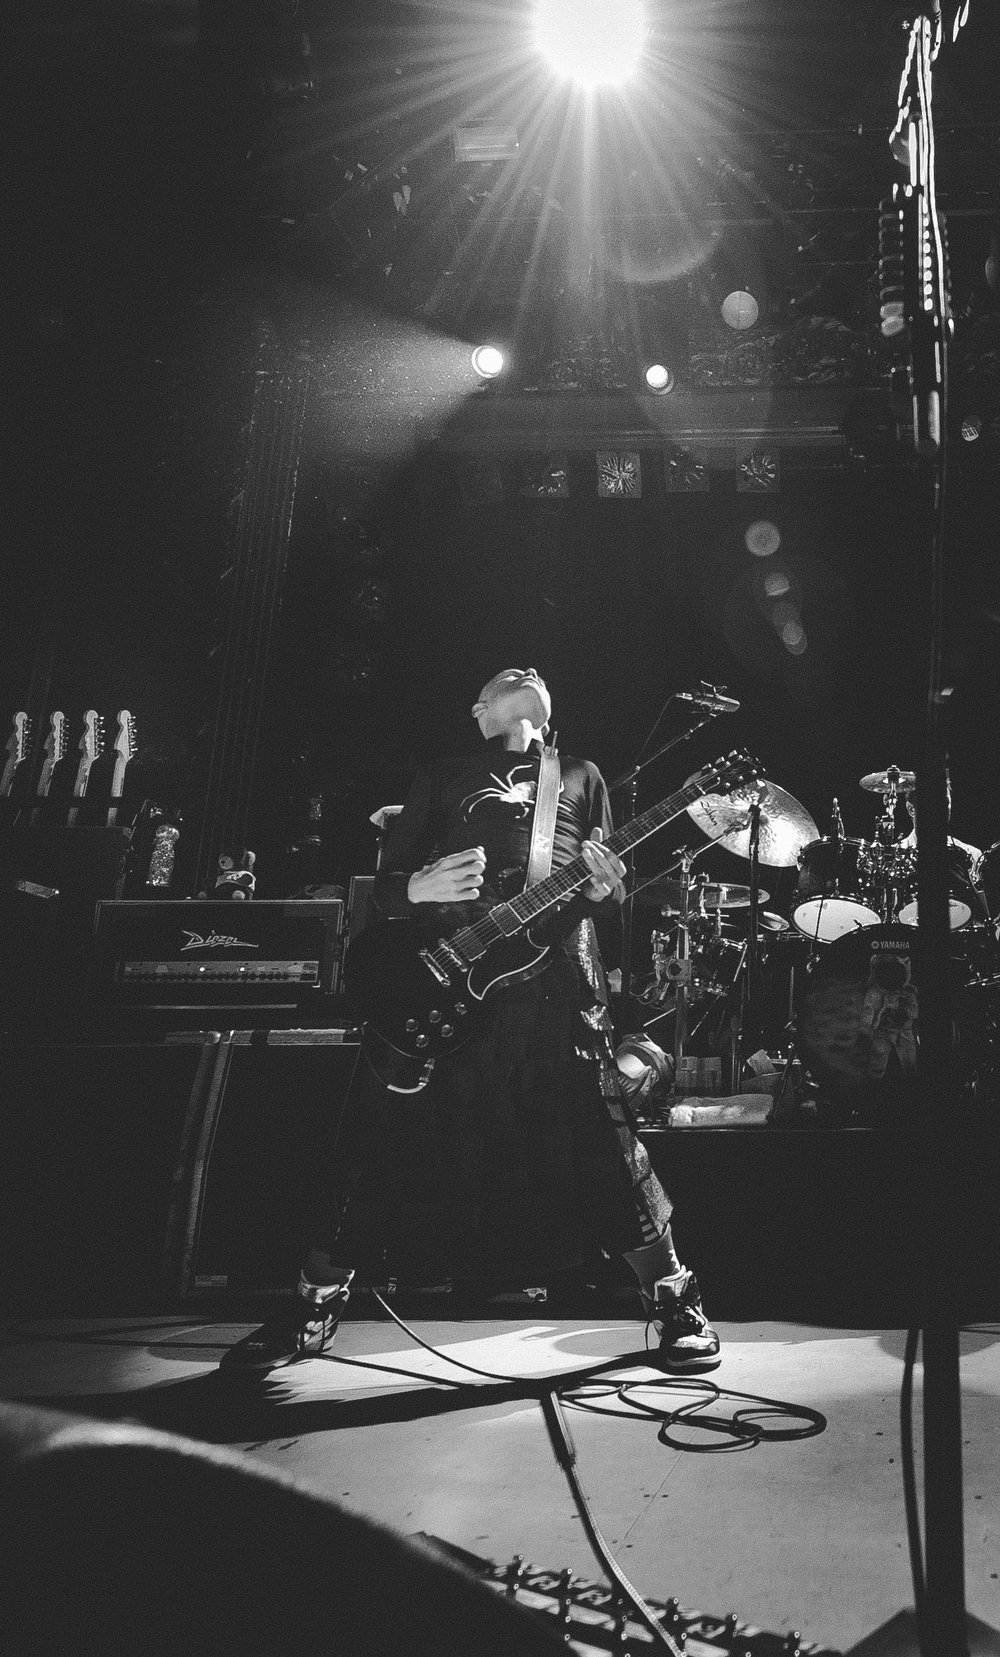 ChadFahnestockPhotography_Concert_portfolio_Squarespace-037.jpg